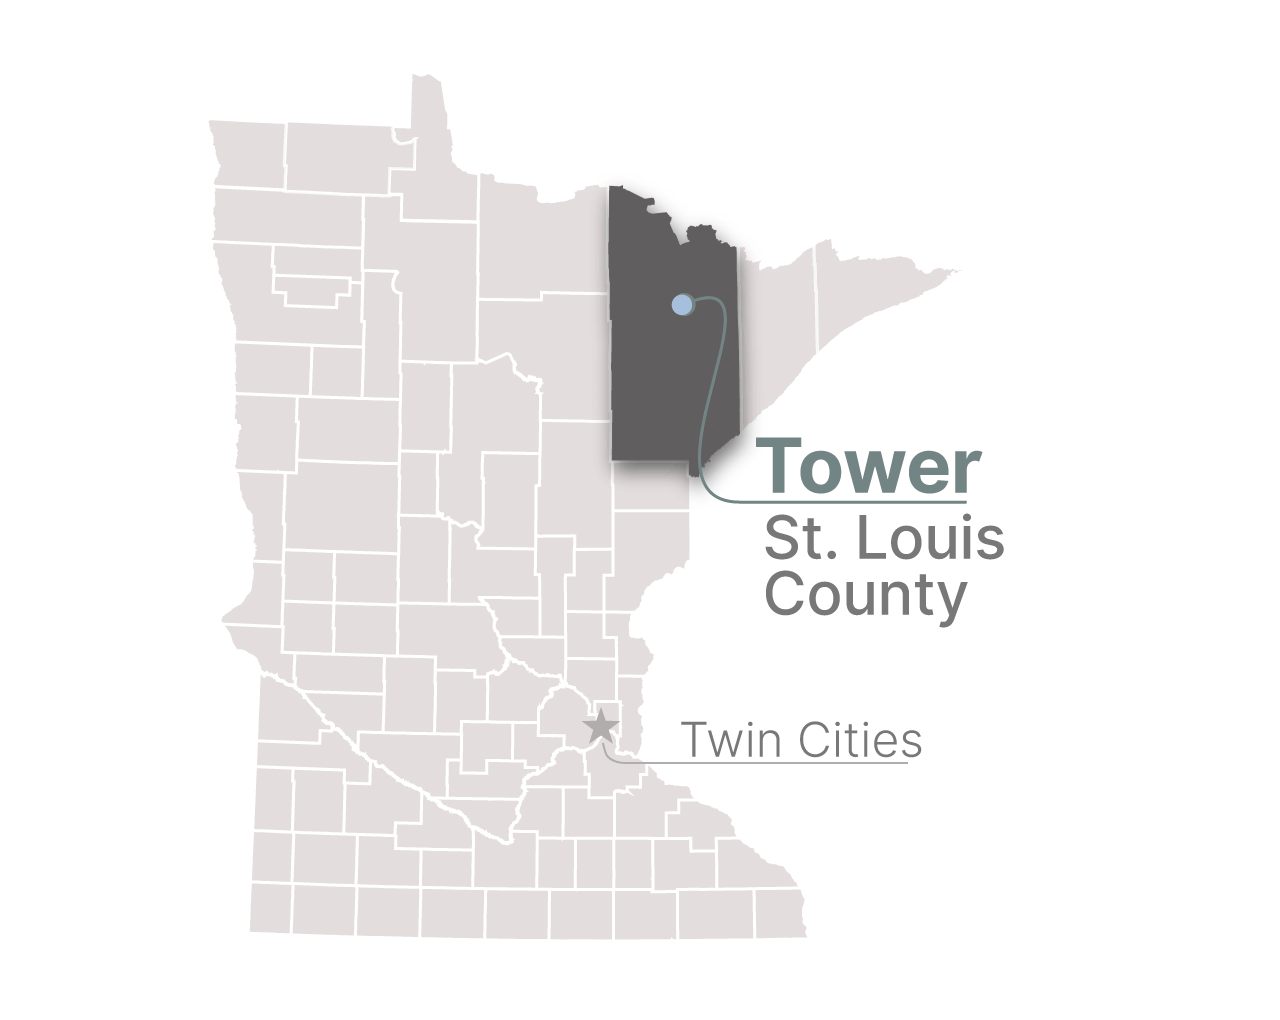 Tower, Minn.